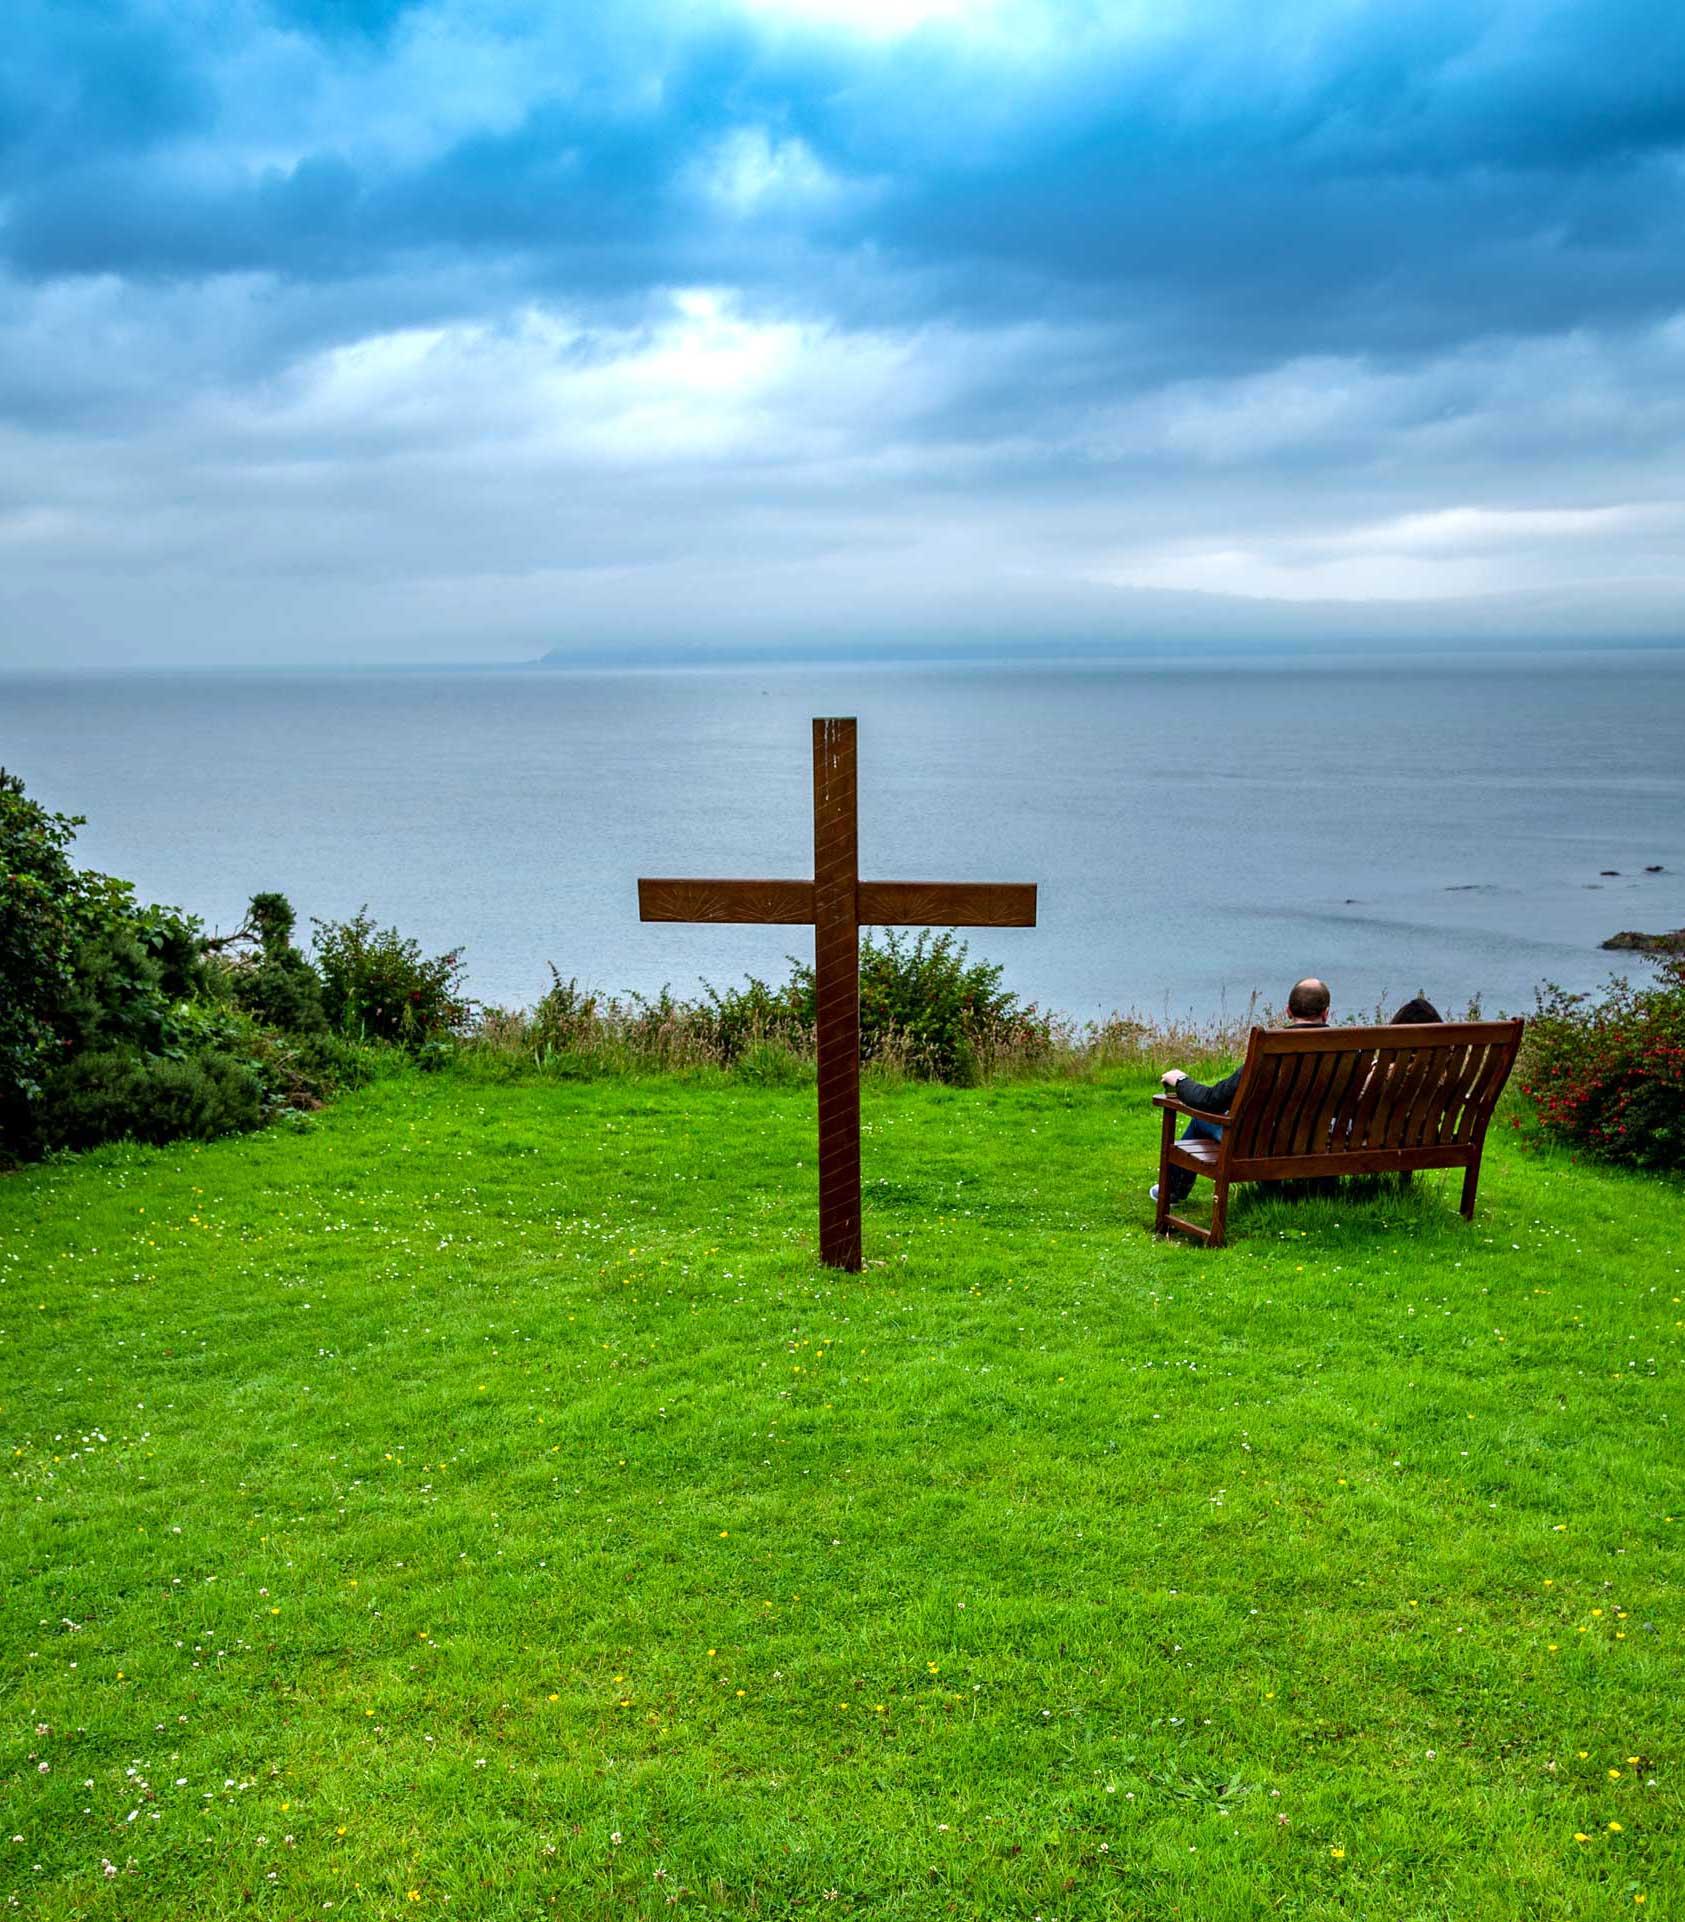 Corrymeela at Ballycastle has a stunning view over the Atlantic Ocean